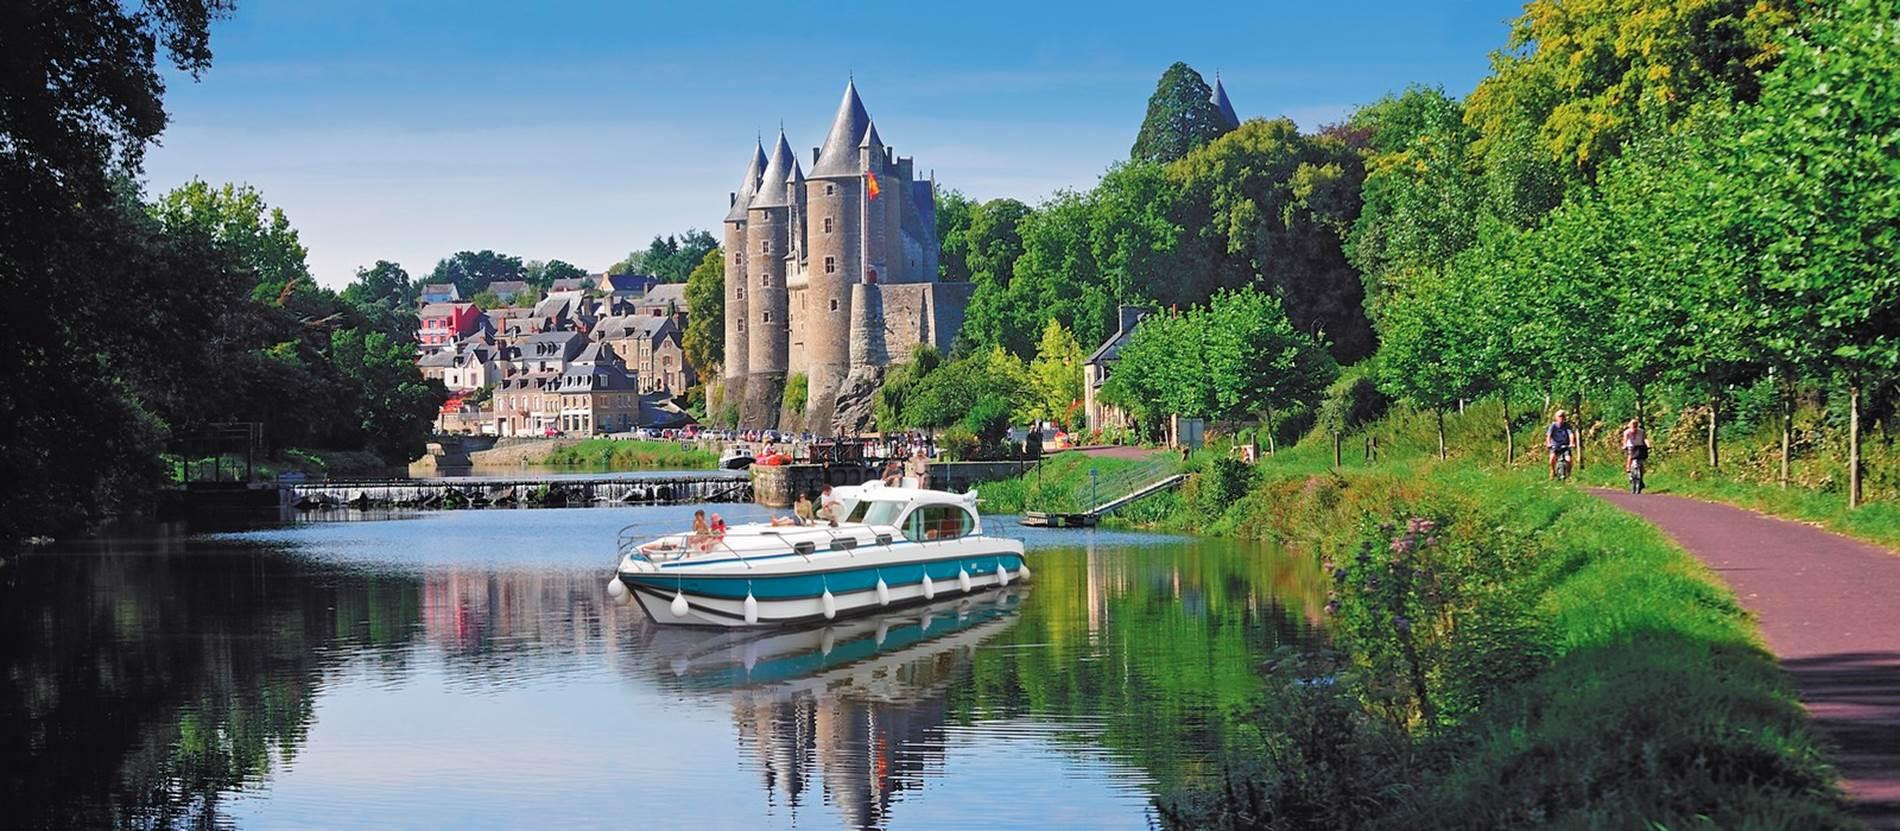 Josselin_Croisiere_canal_Nantes_à_Brest_Morbihan_Bretagne_Sud © Yannick Le Gal - Nicols